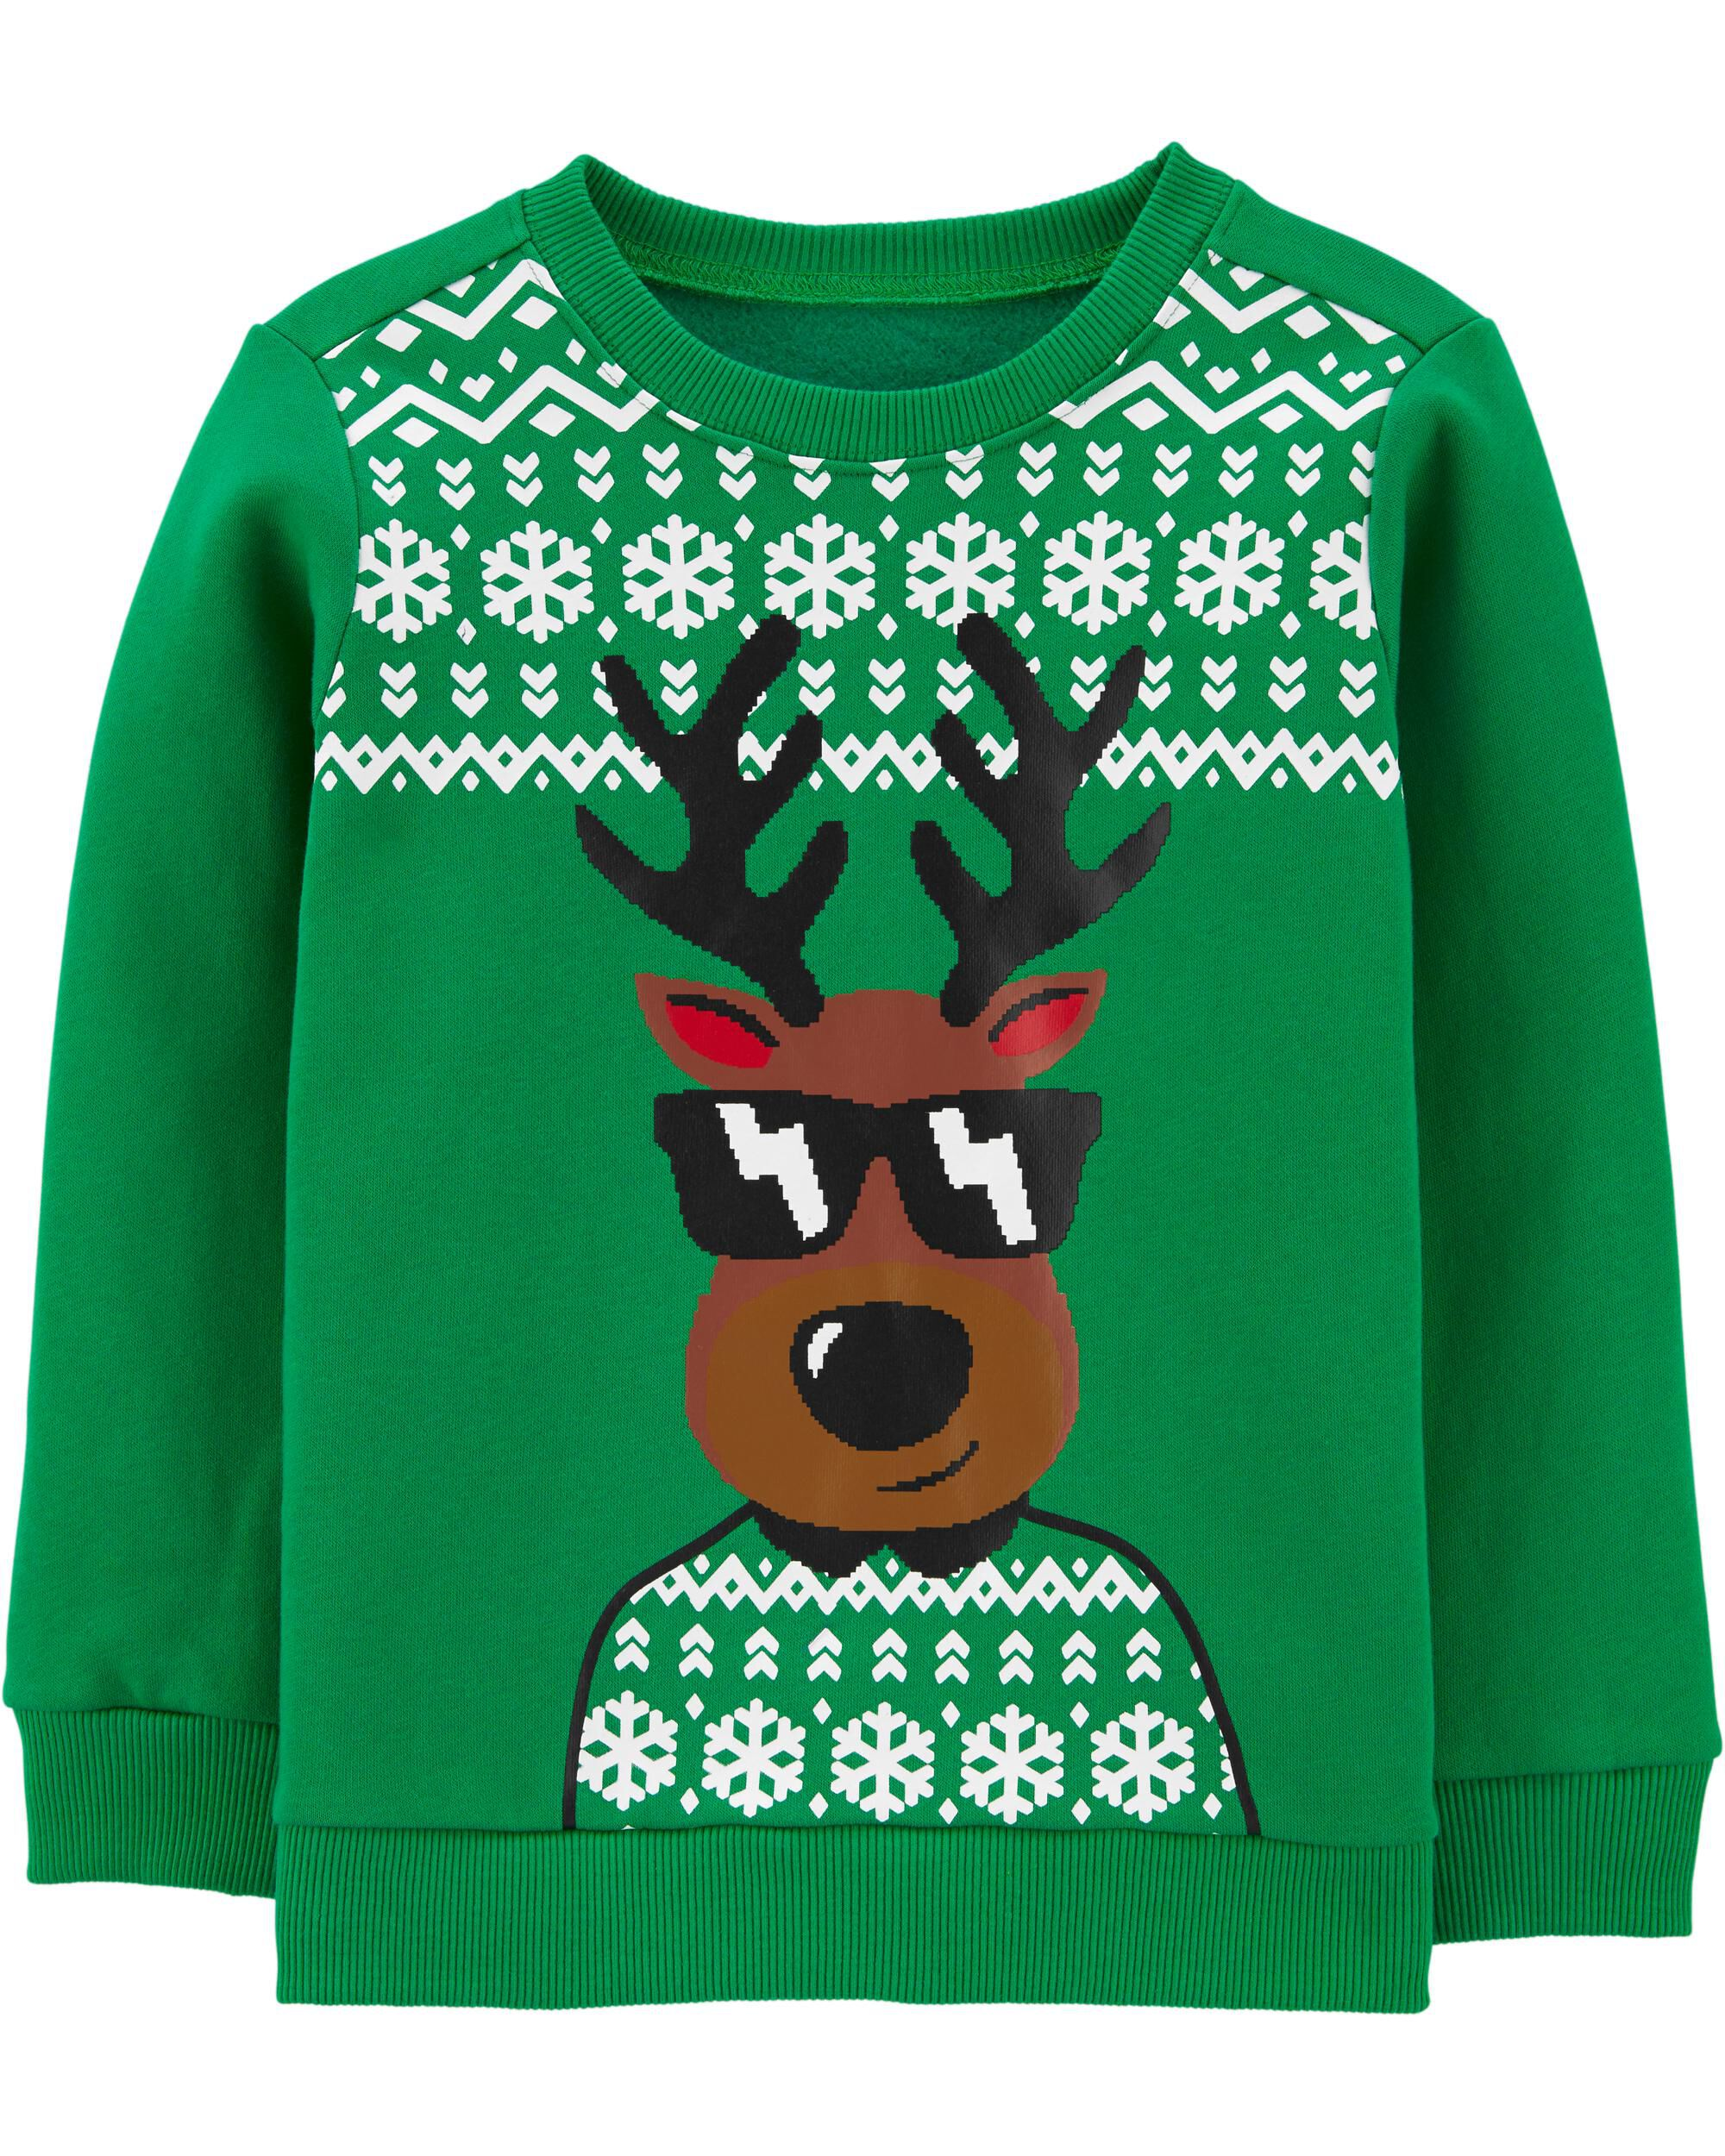 Reindeer Christmas Crew Neck Sweatshirt  